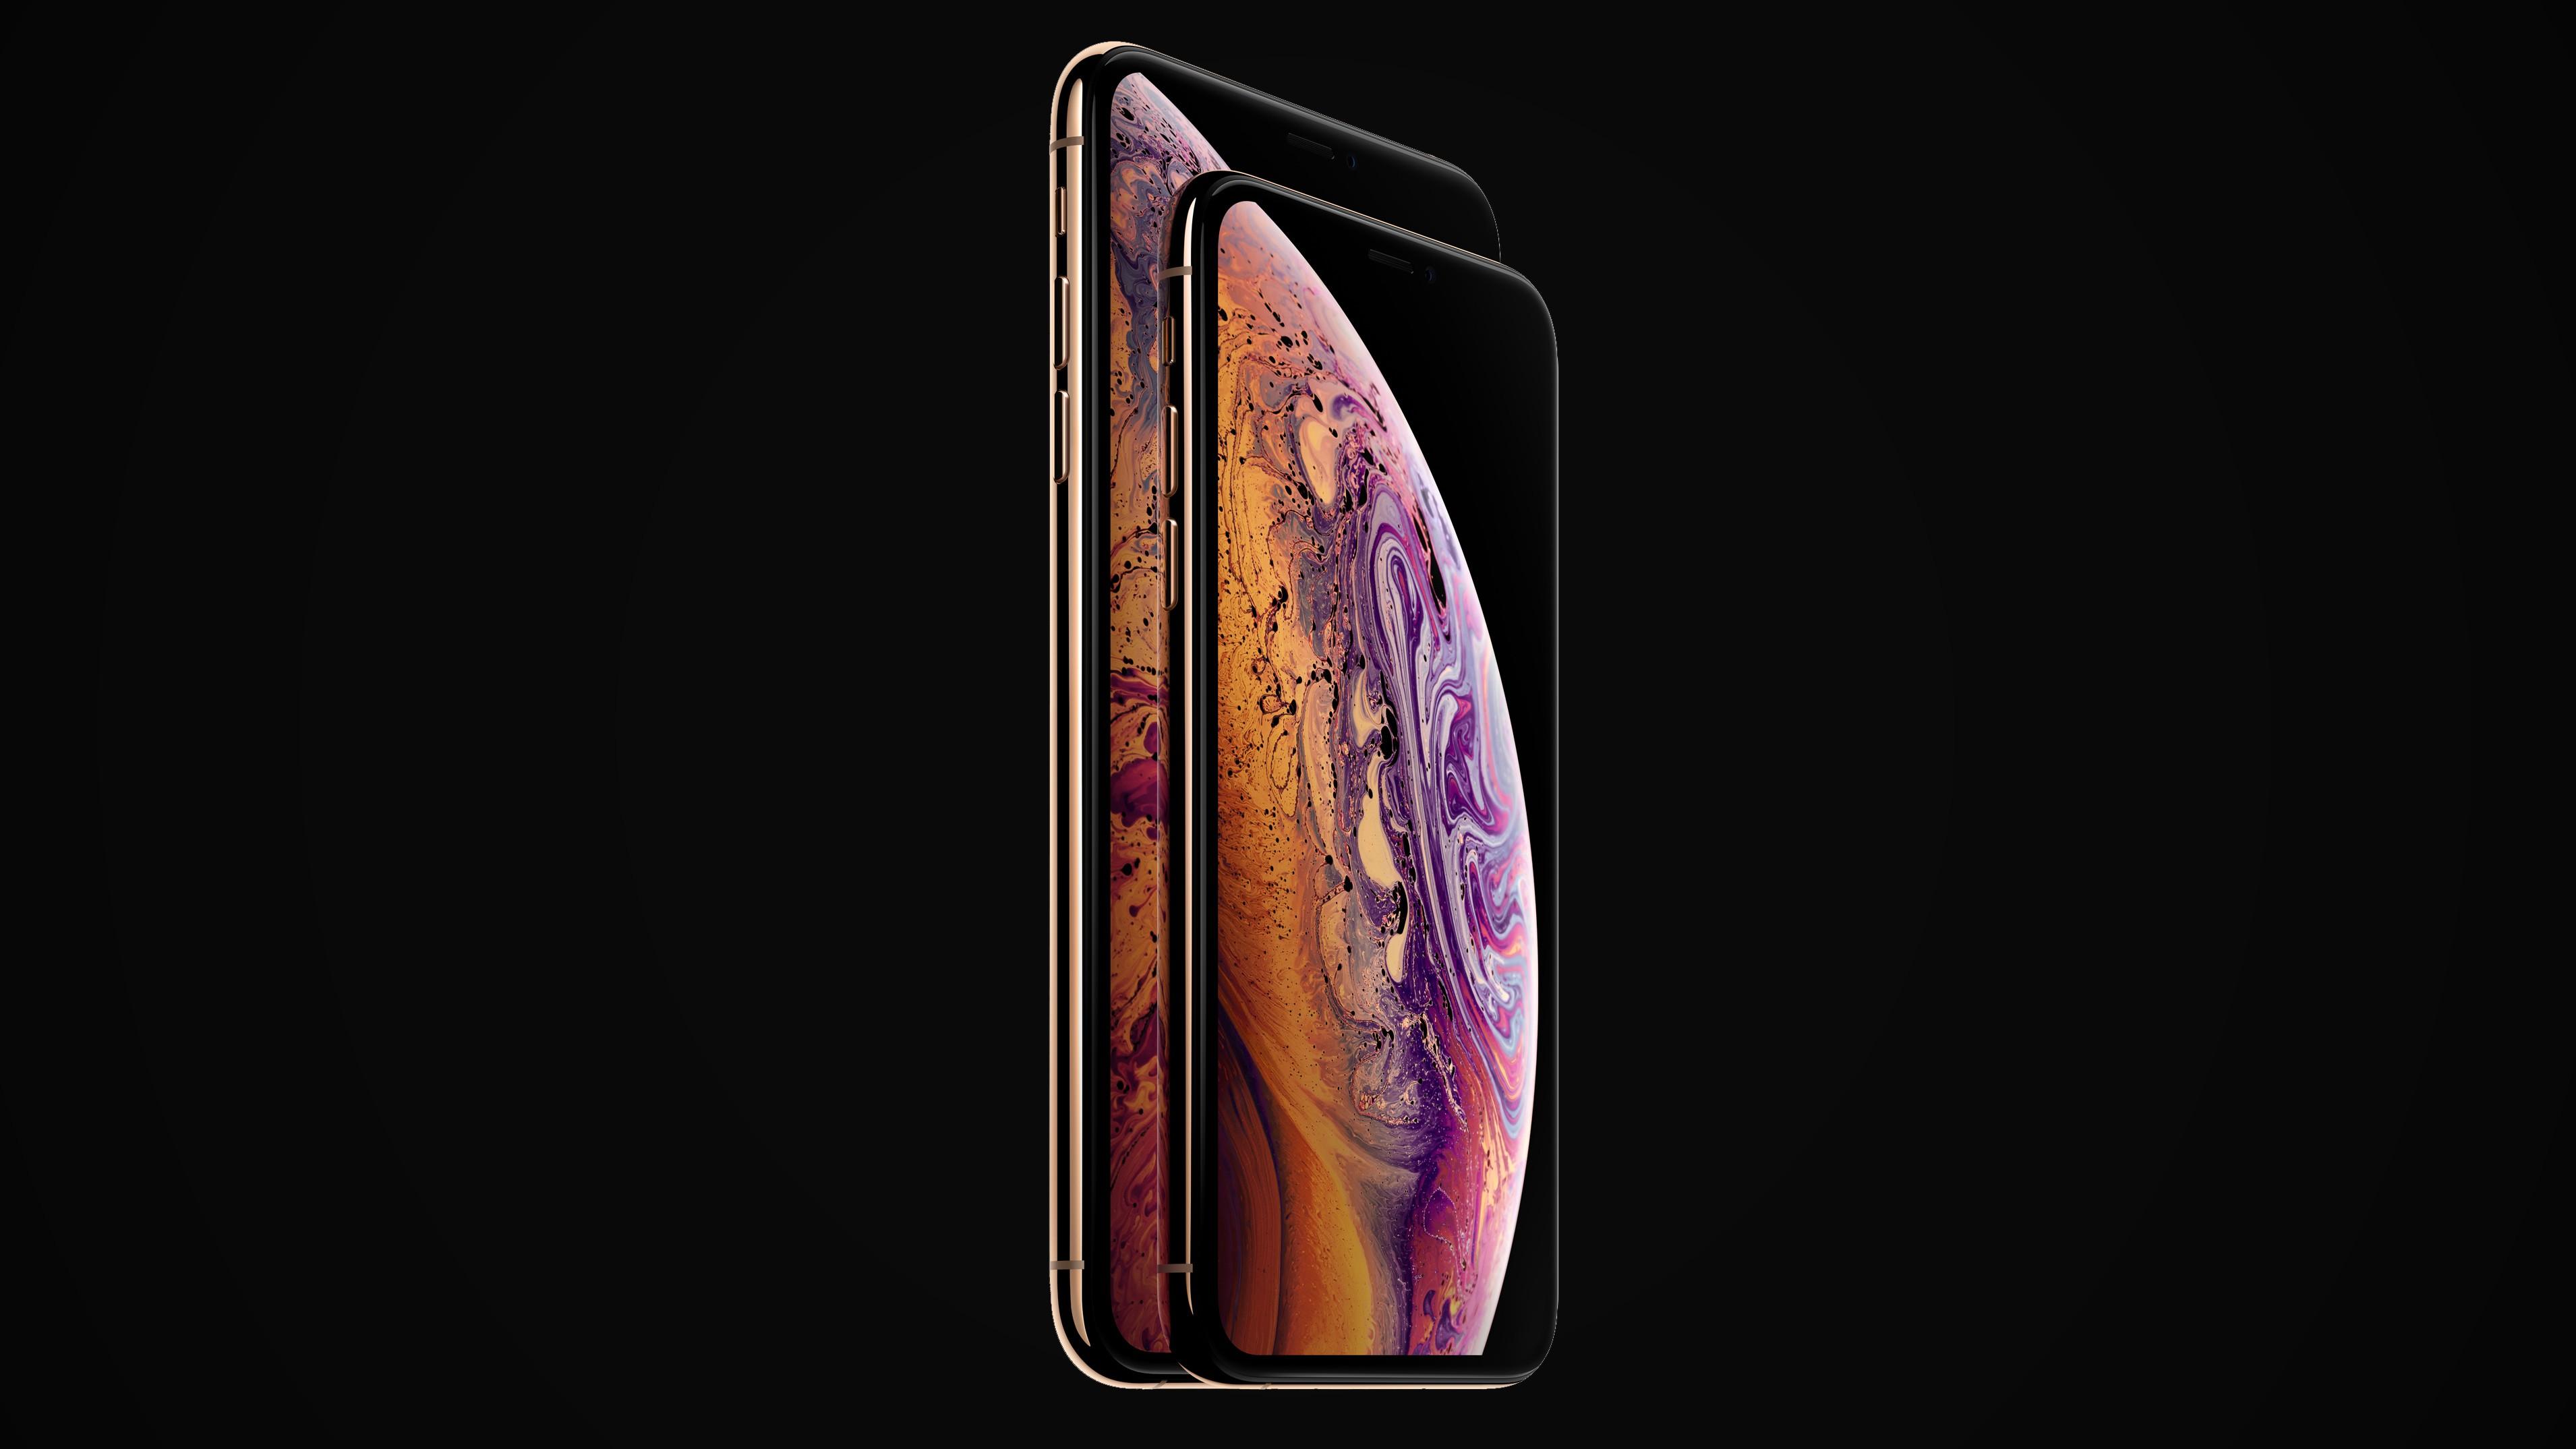 iPhone XS и XS Max —больше, мощнее, лучше